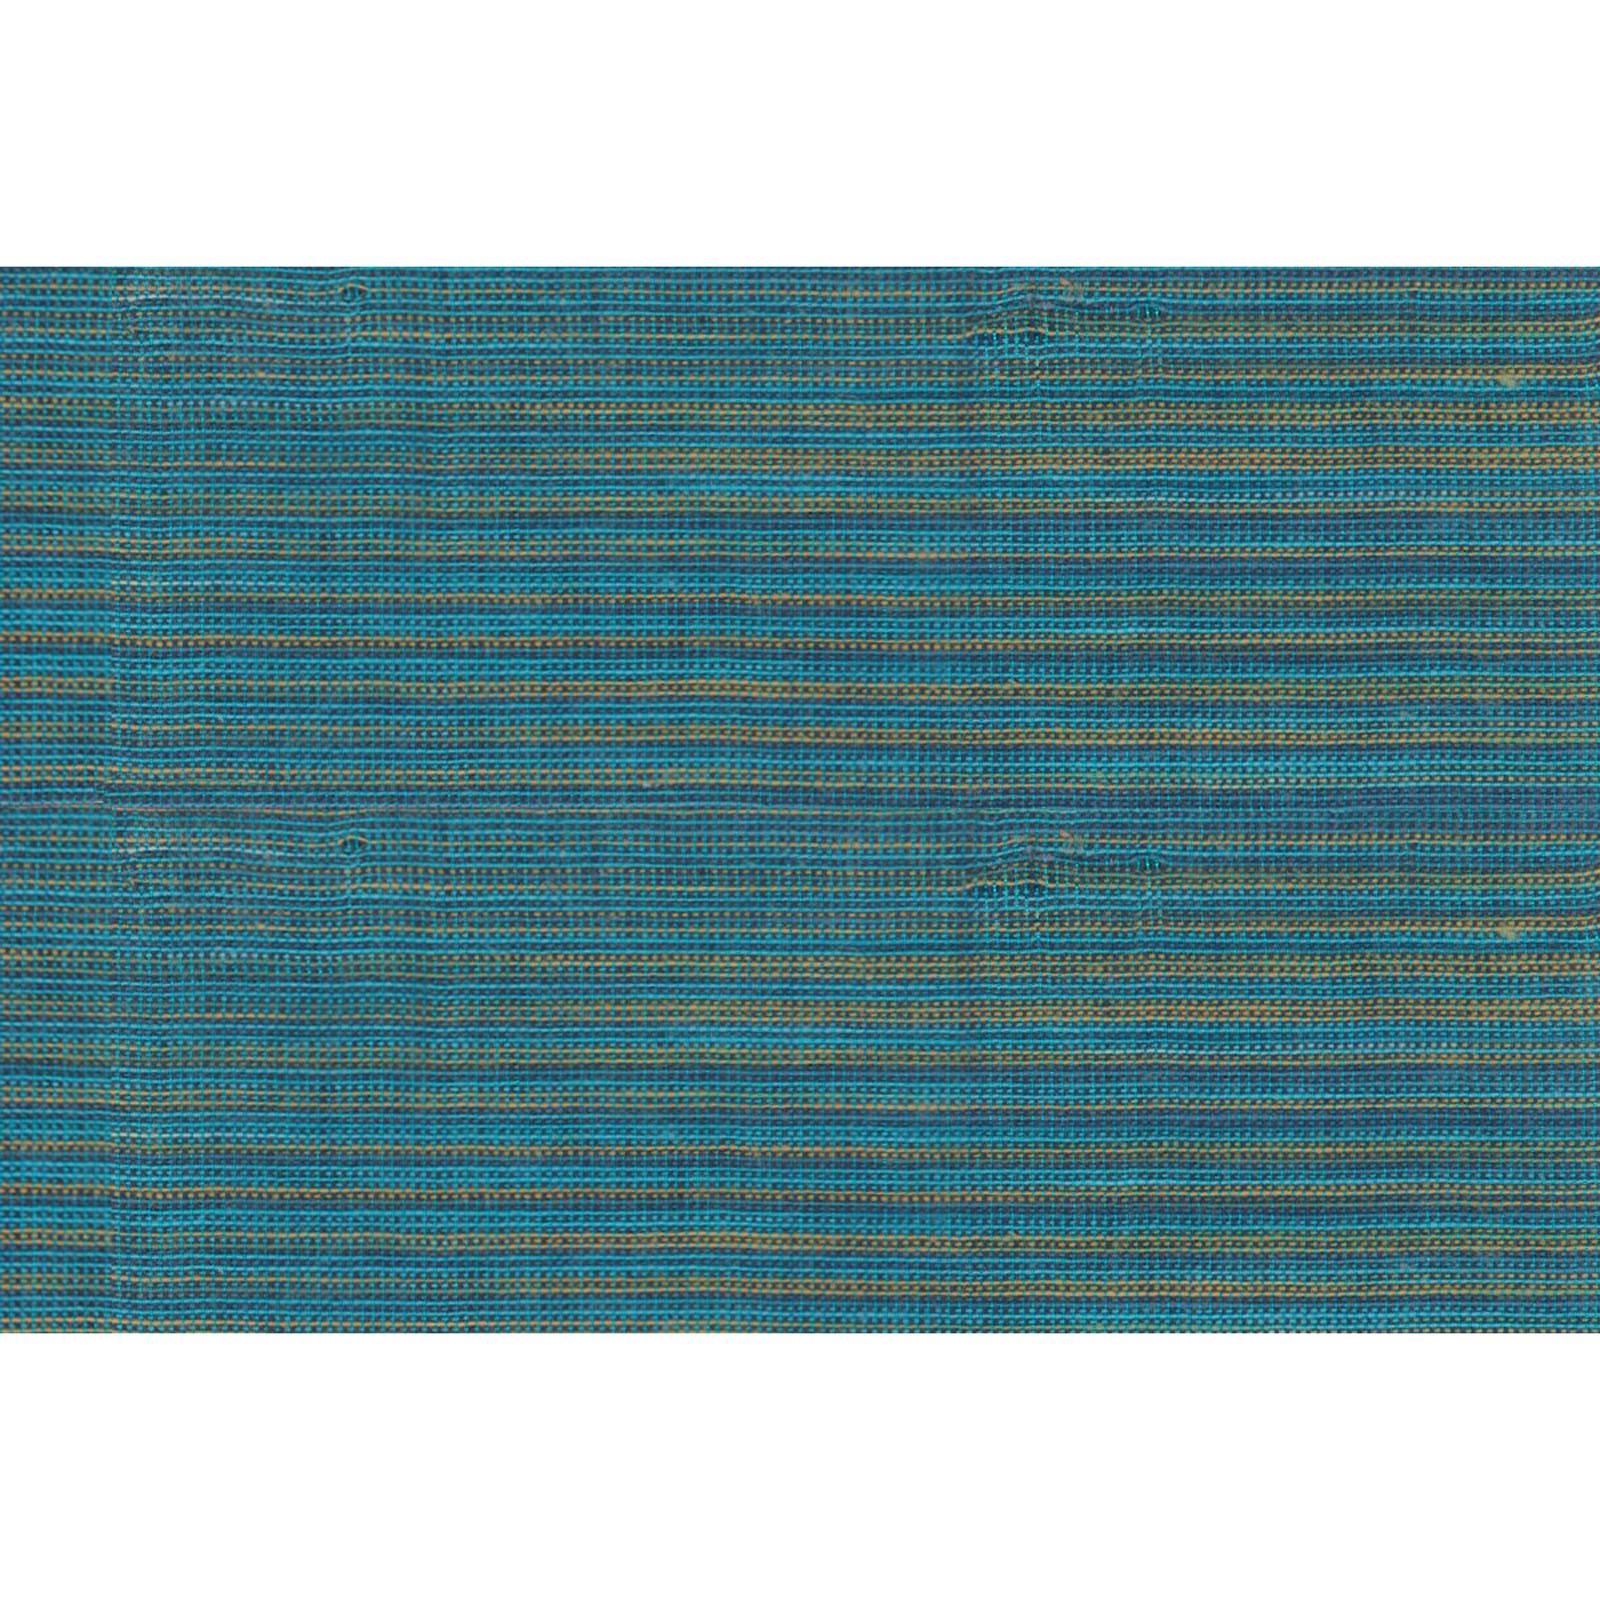 Sedona Sunset Metallic Teal DS002<br/>Textile Creations